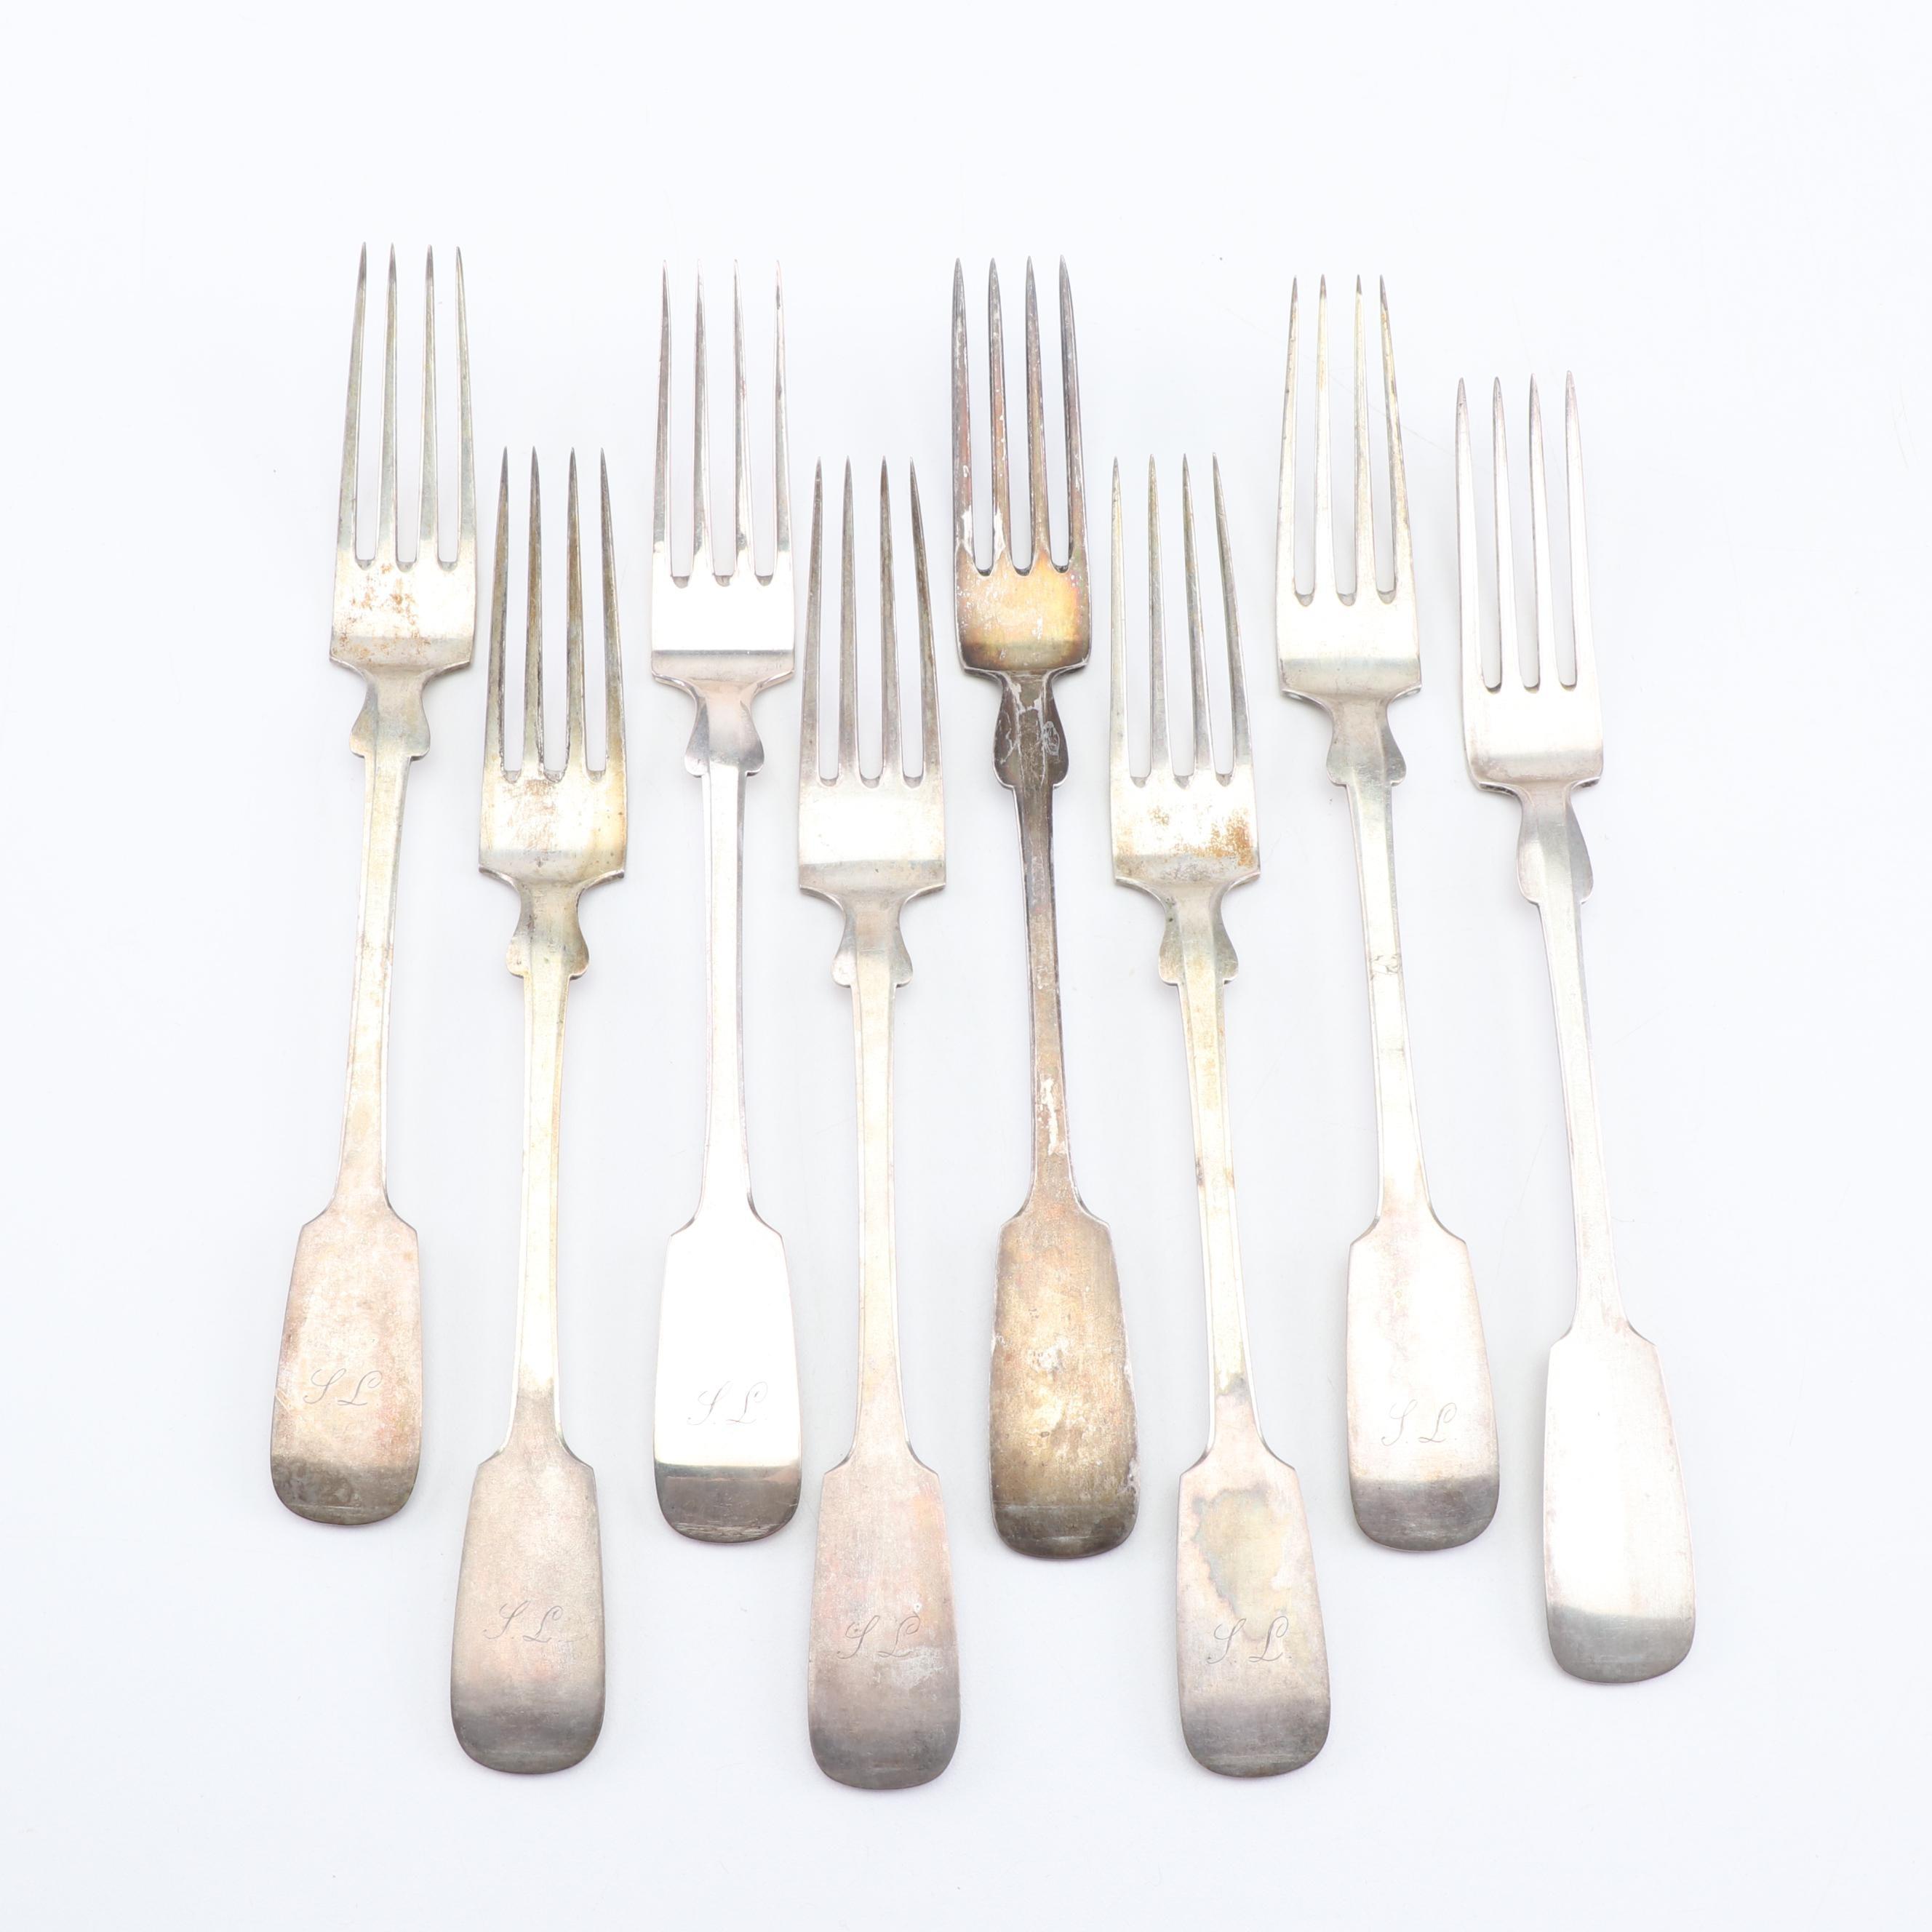 Fraenkel German 800 Silver Dinner Forks, Mid-19th Century